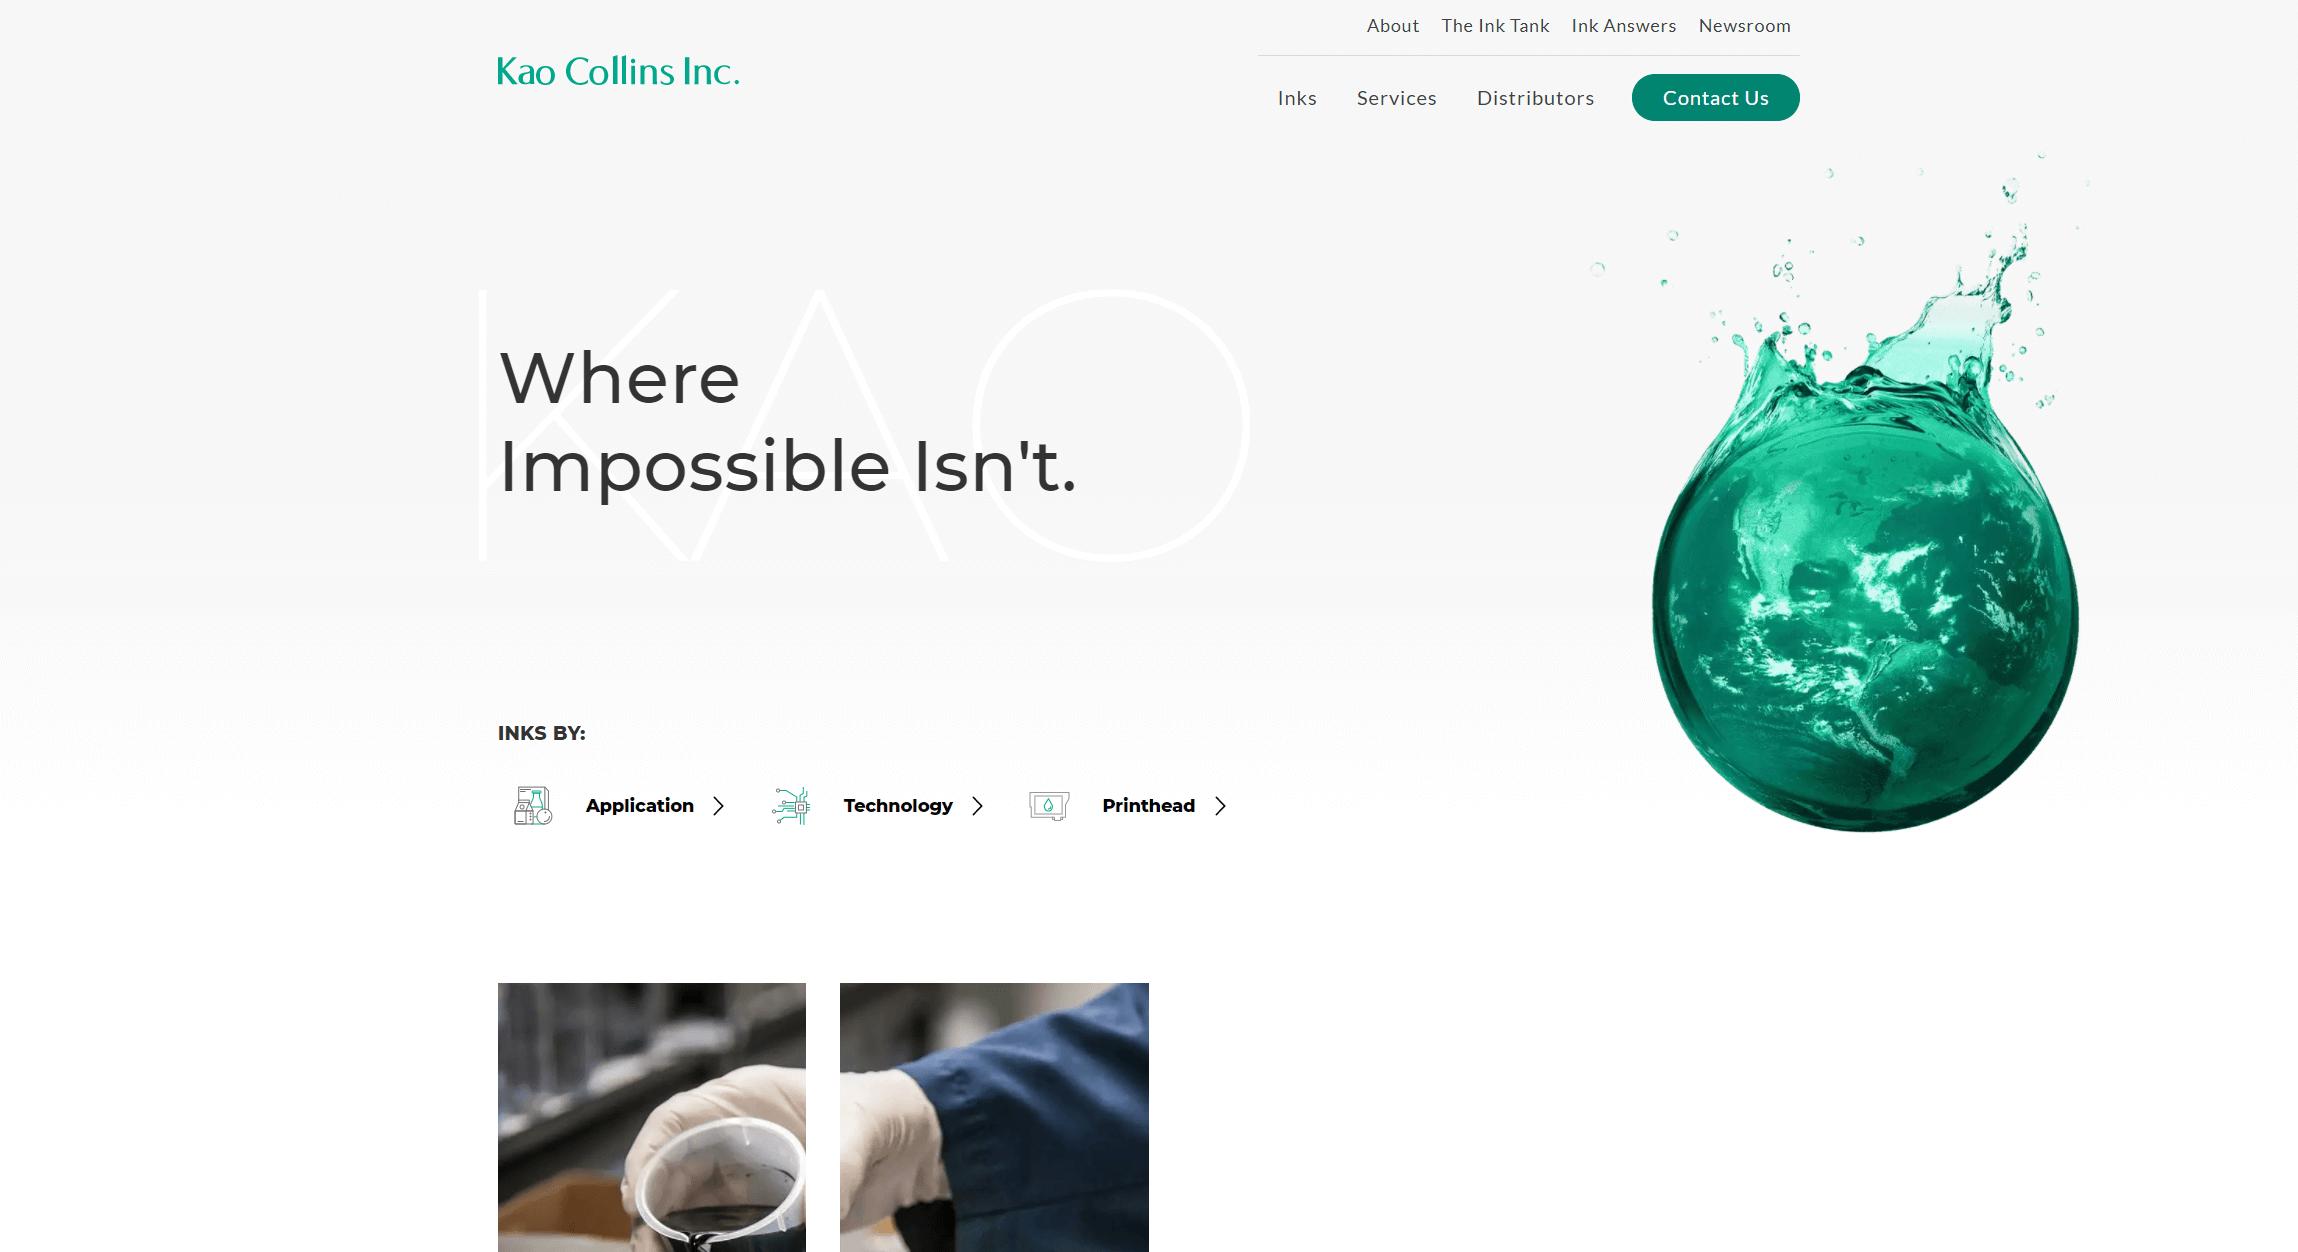 www.kaocollins.com